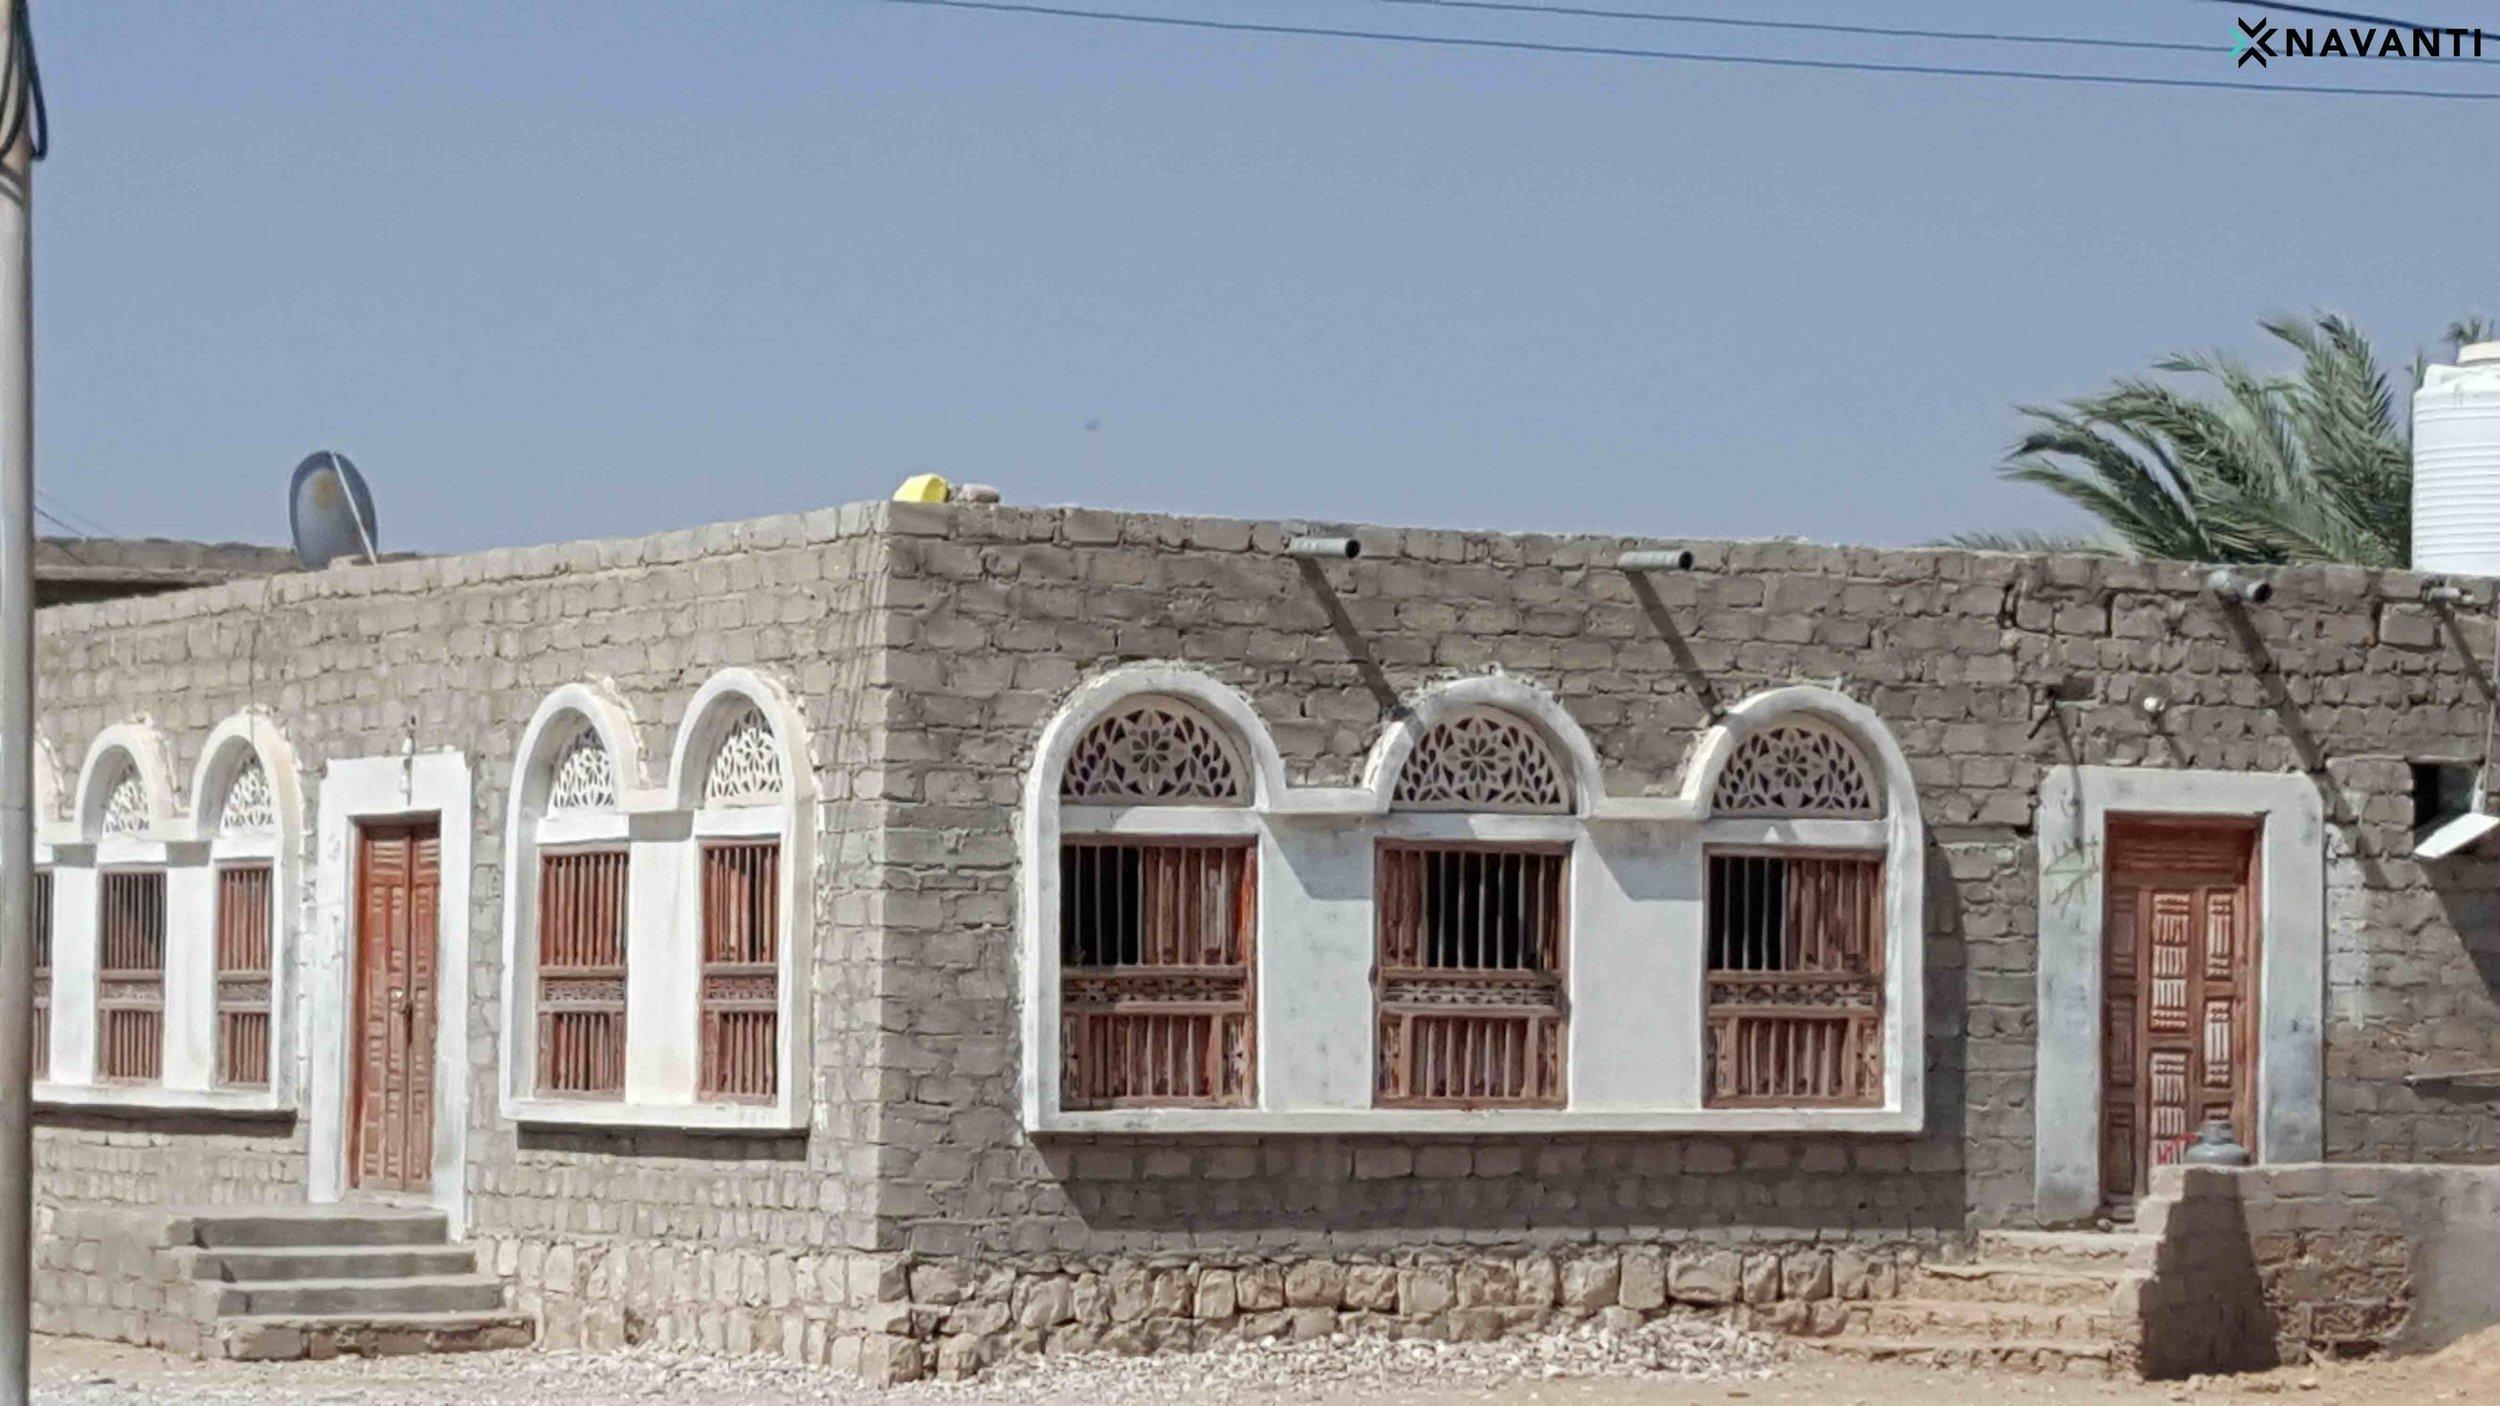 Traditional houses in Sayhut, al-Mahra. Source: Navanti.